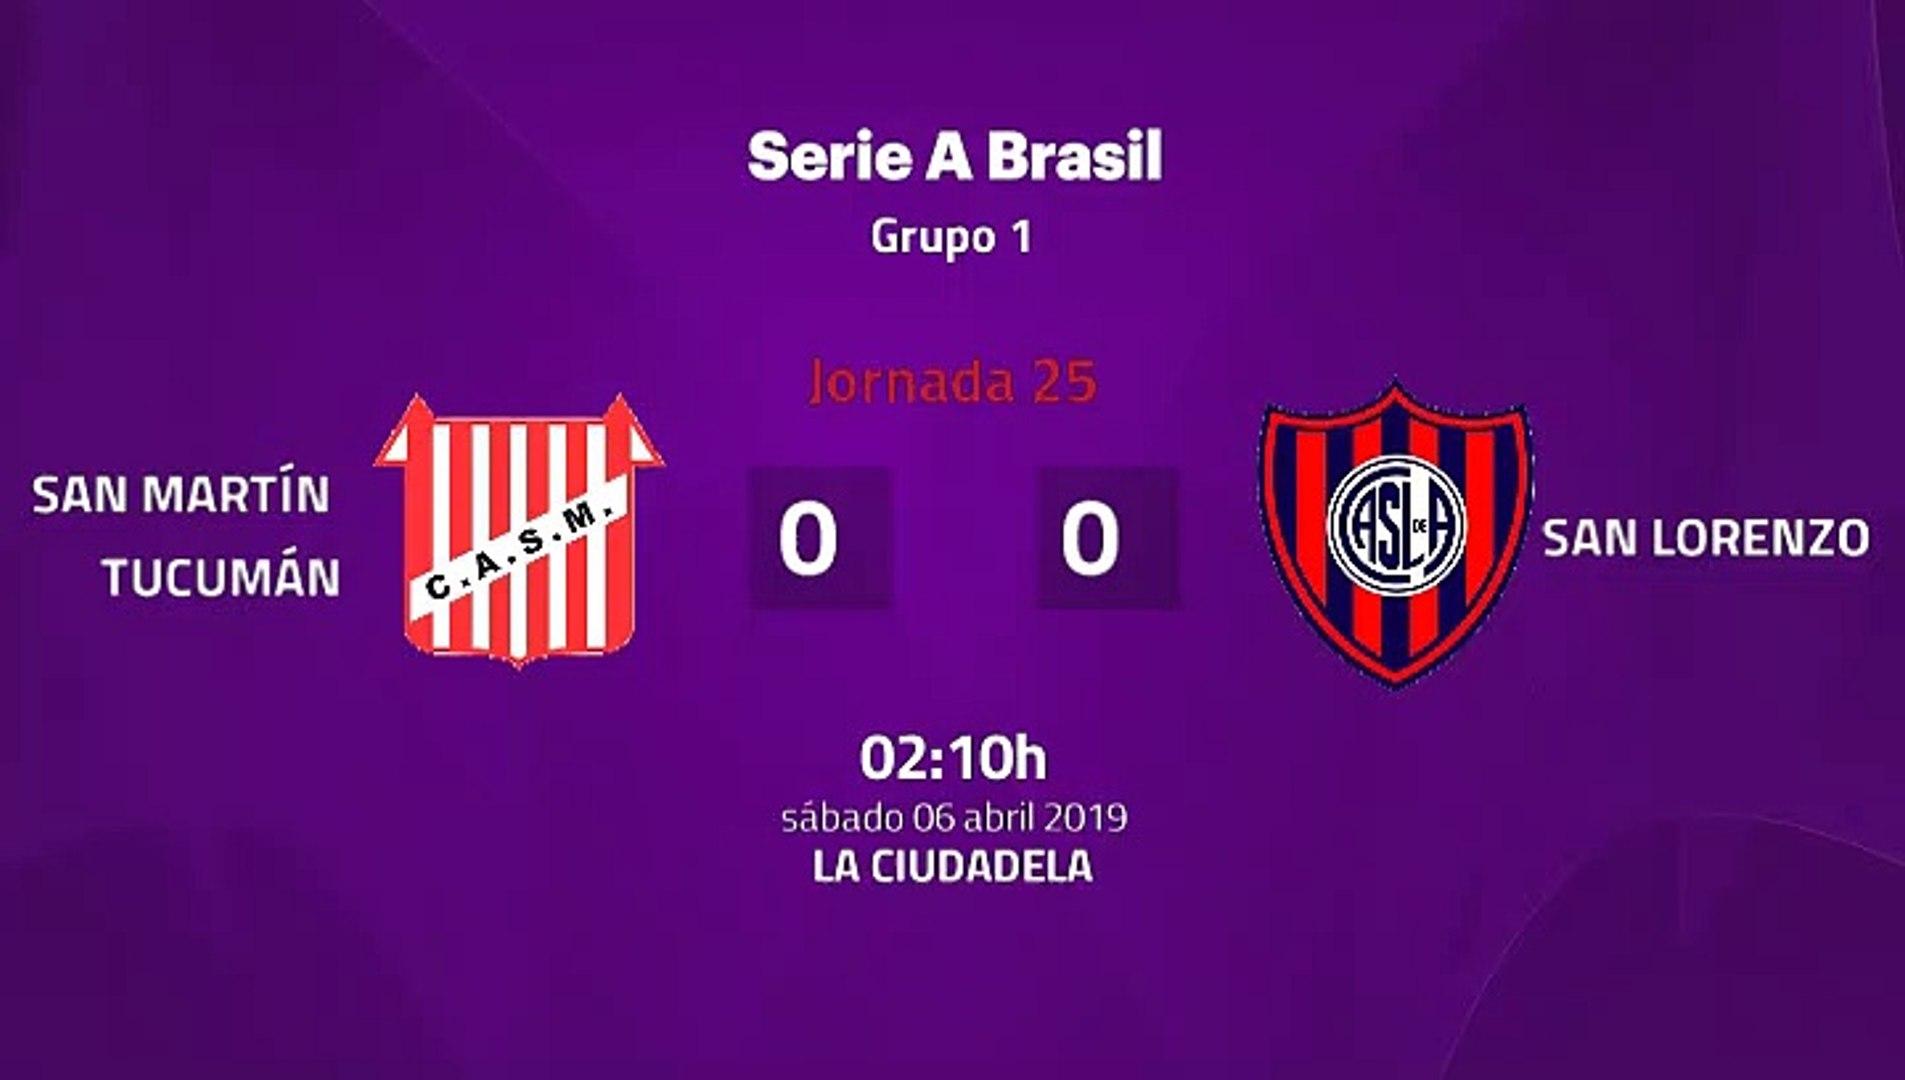 San Martín Tucumán-San Lorenzo Jornada 25 Superliga Argentina 06-04-2019_02-10